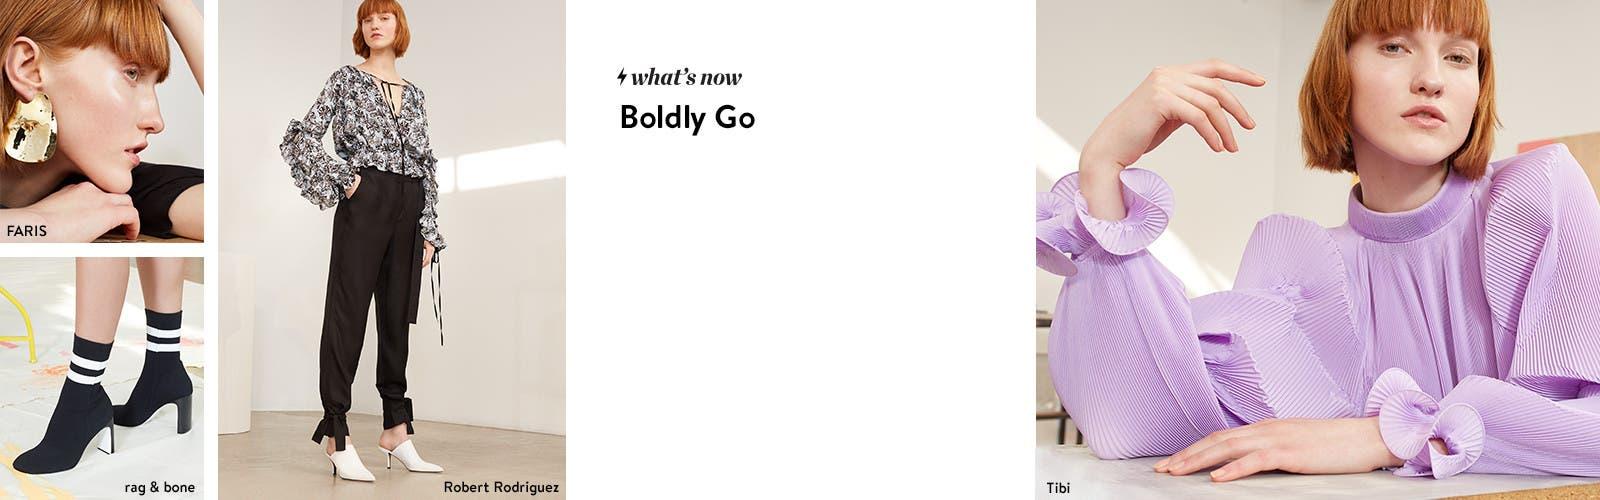 Boldly go.